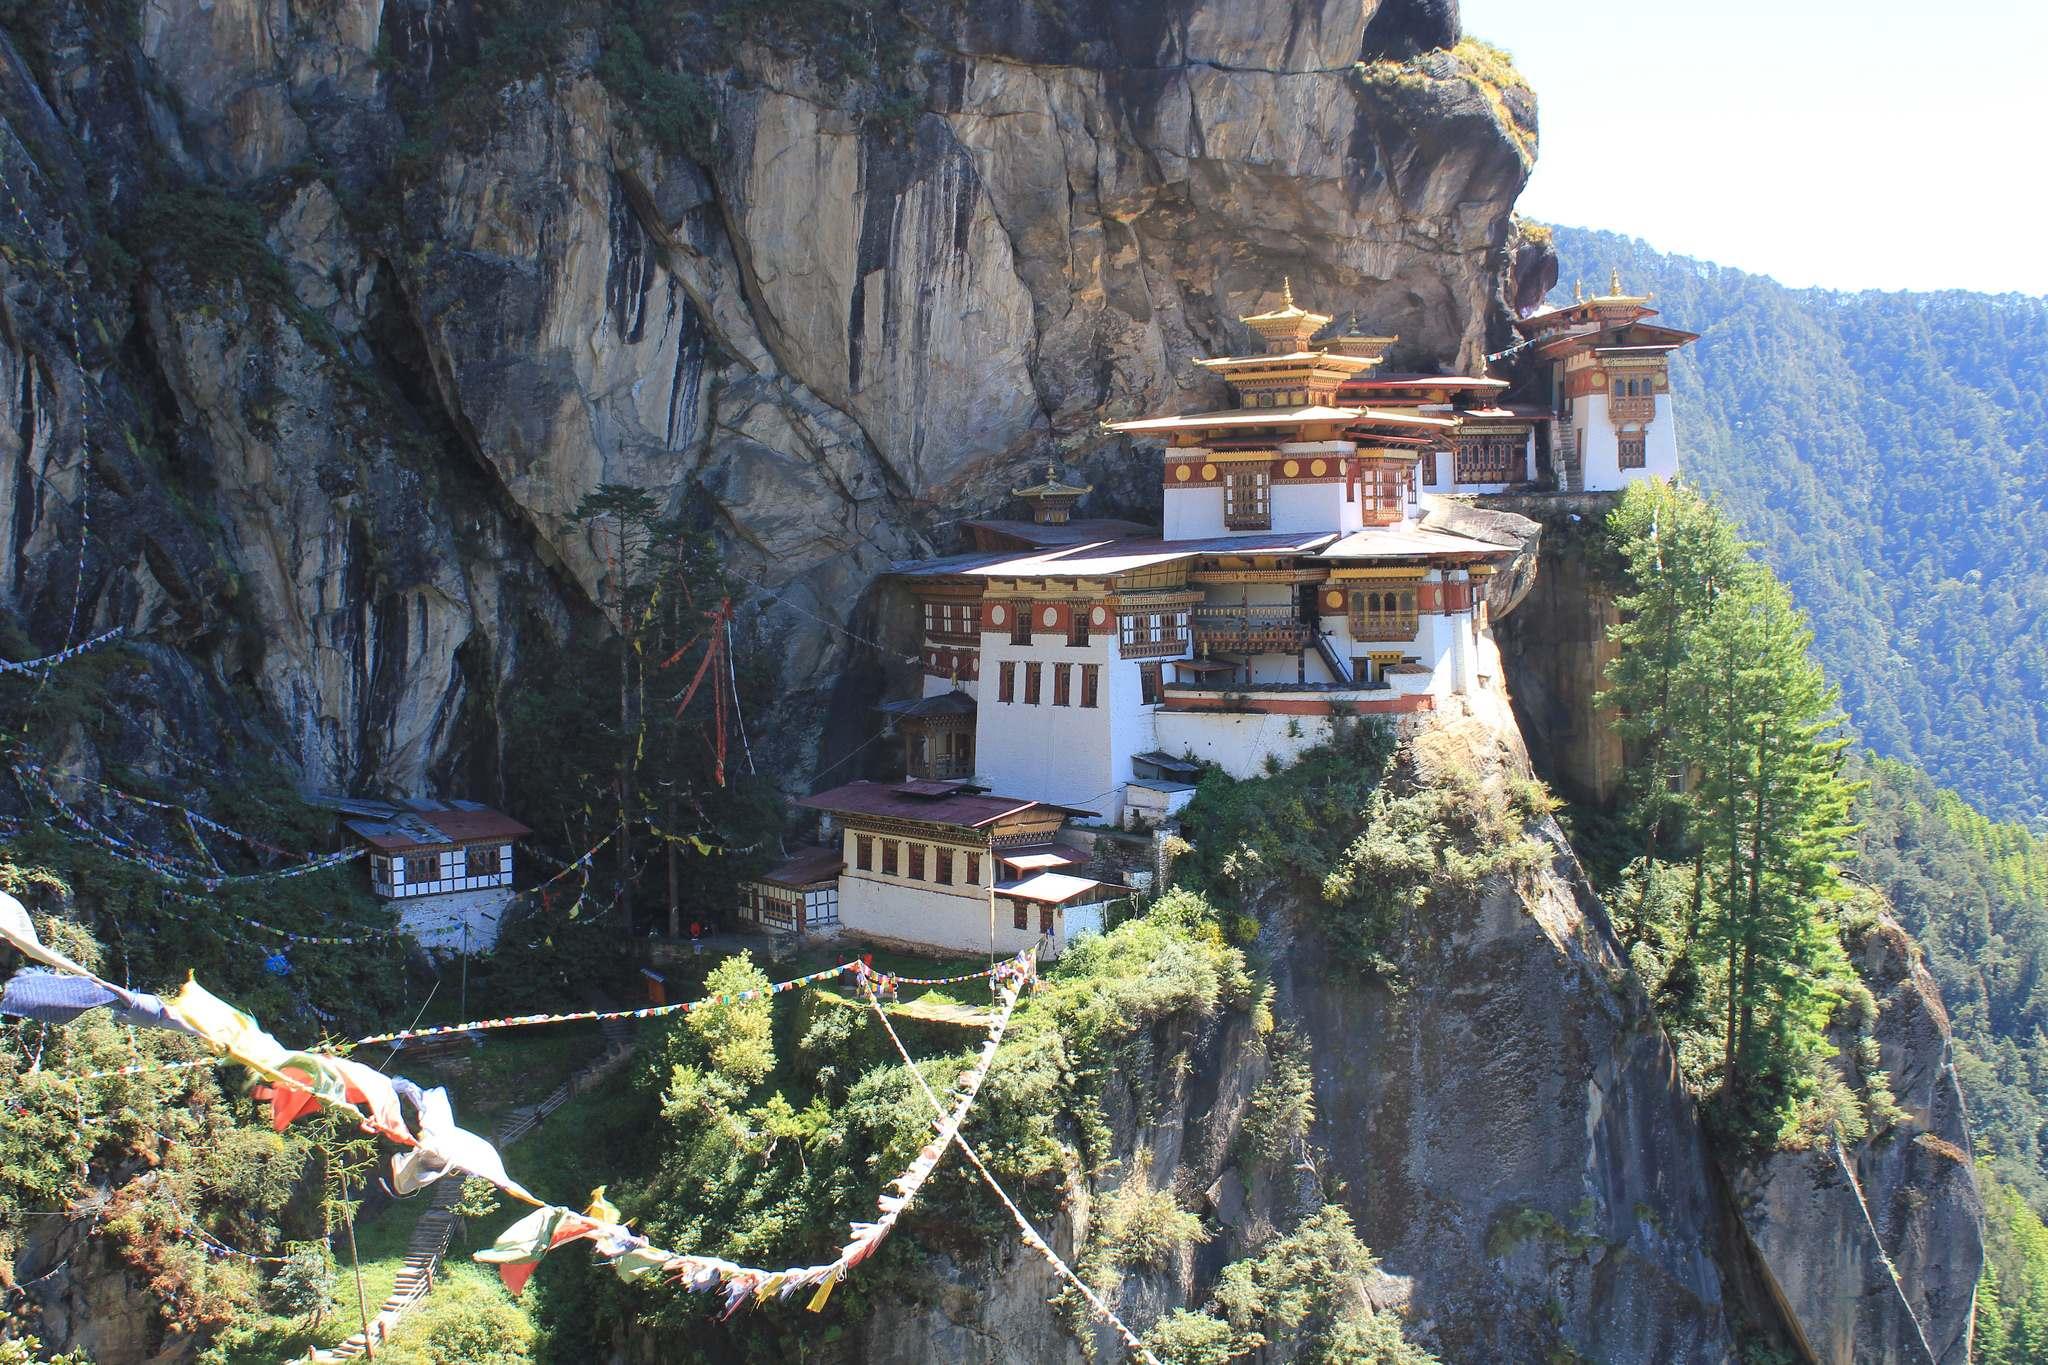 bhutan Bhutan   The Land of the Thunder Dragon